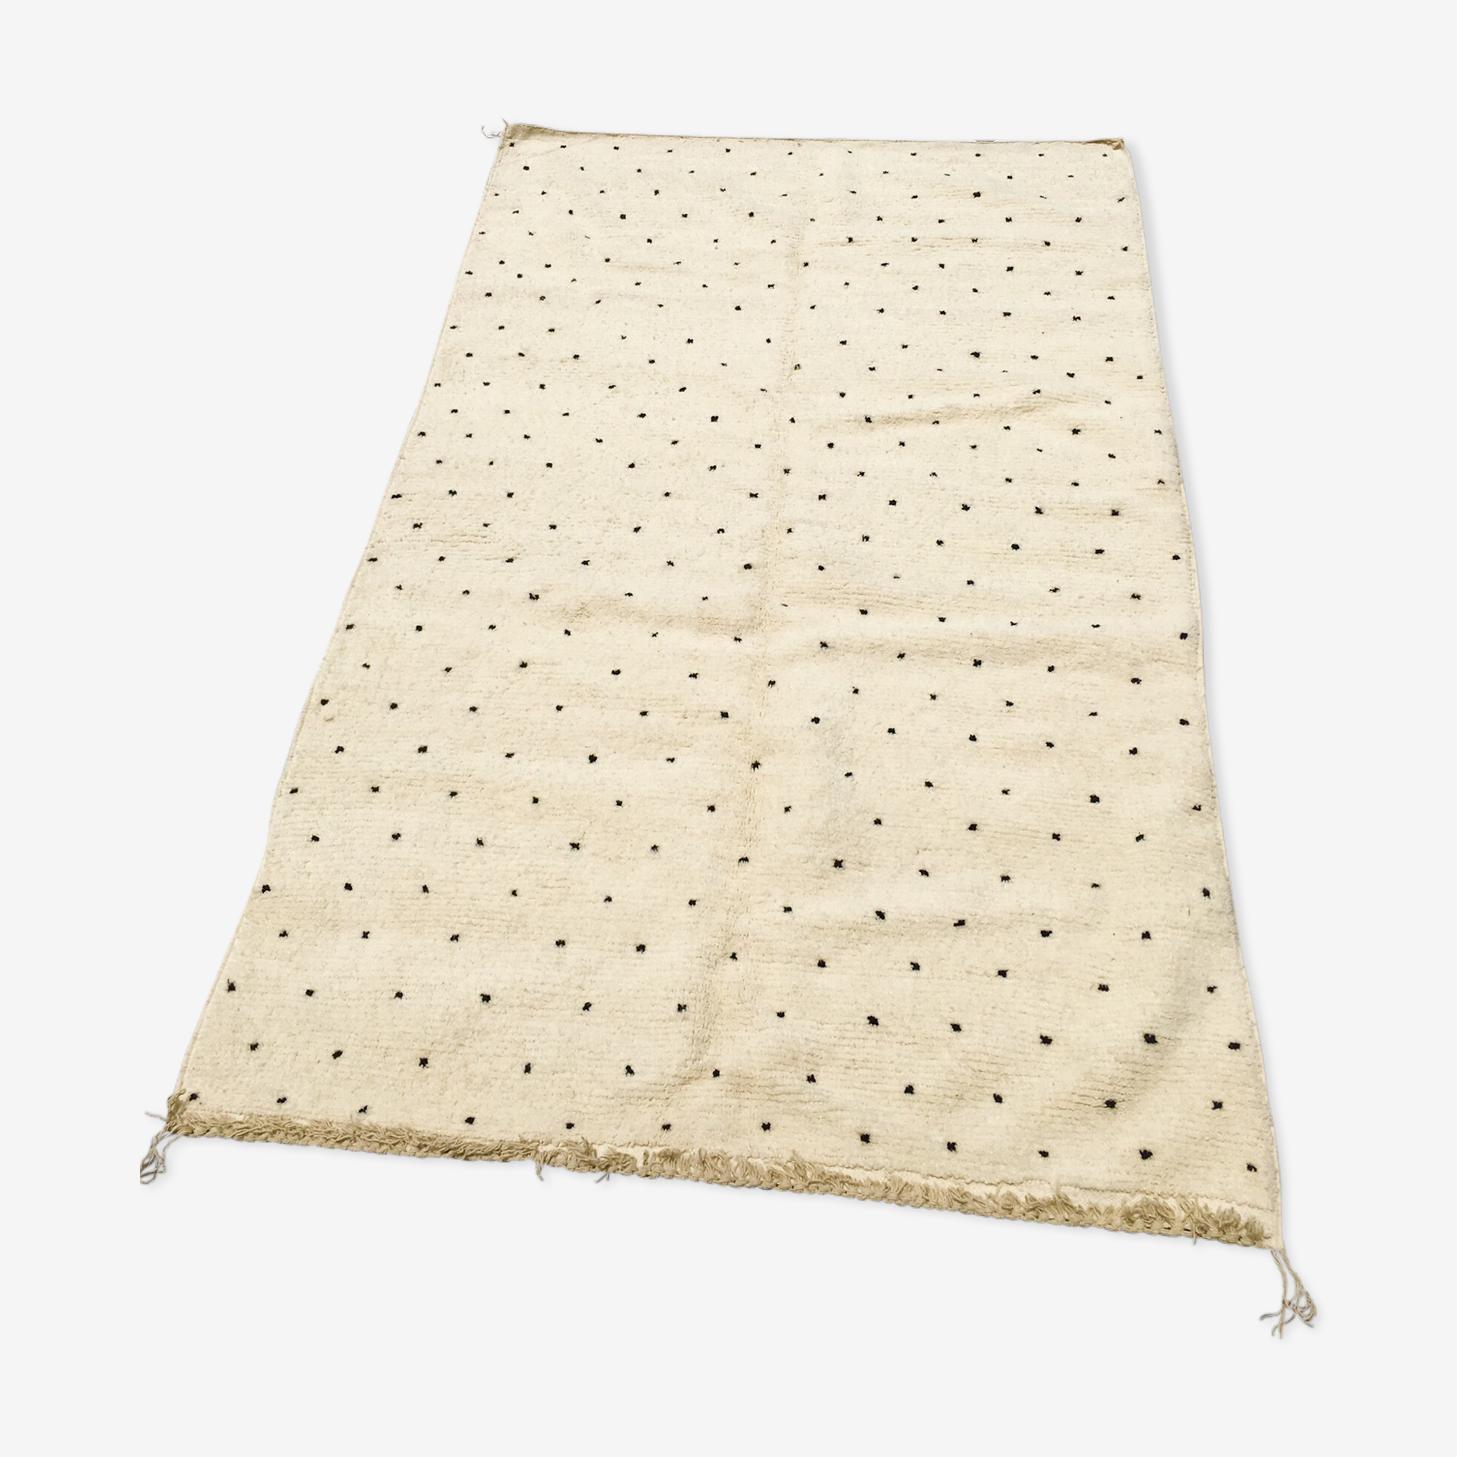 Berber beni ouarain carpet 300x200cm